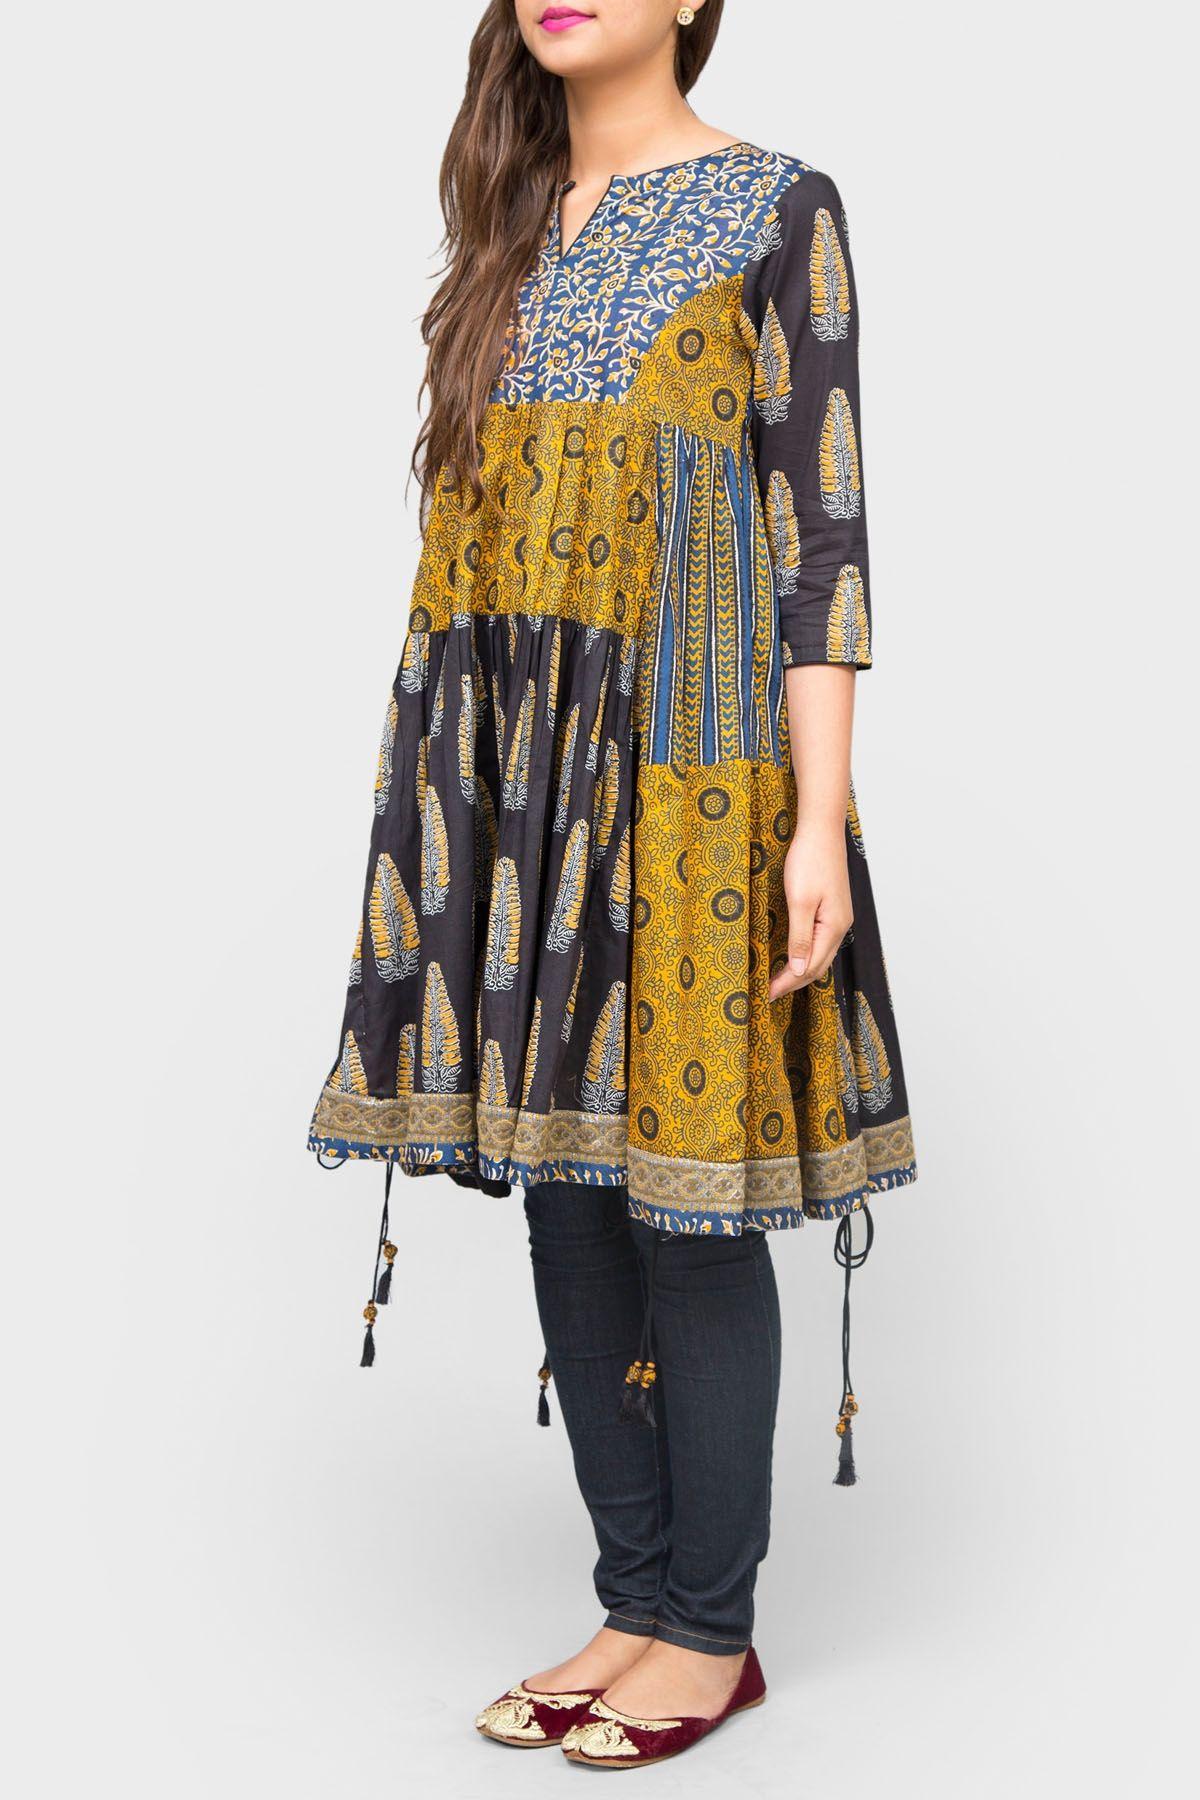 Pakistani Cotton Dresses 2019